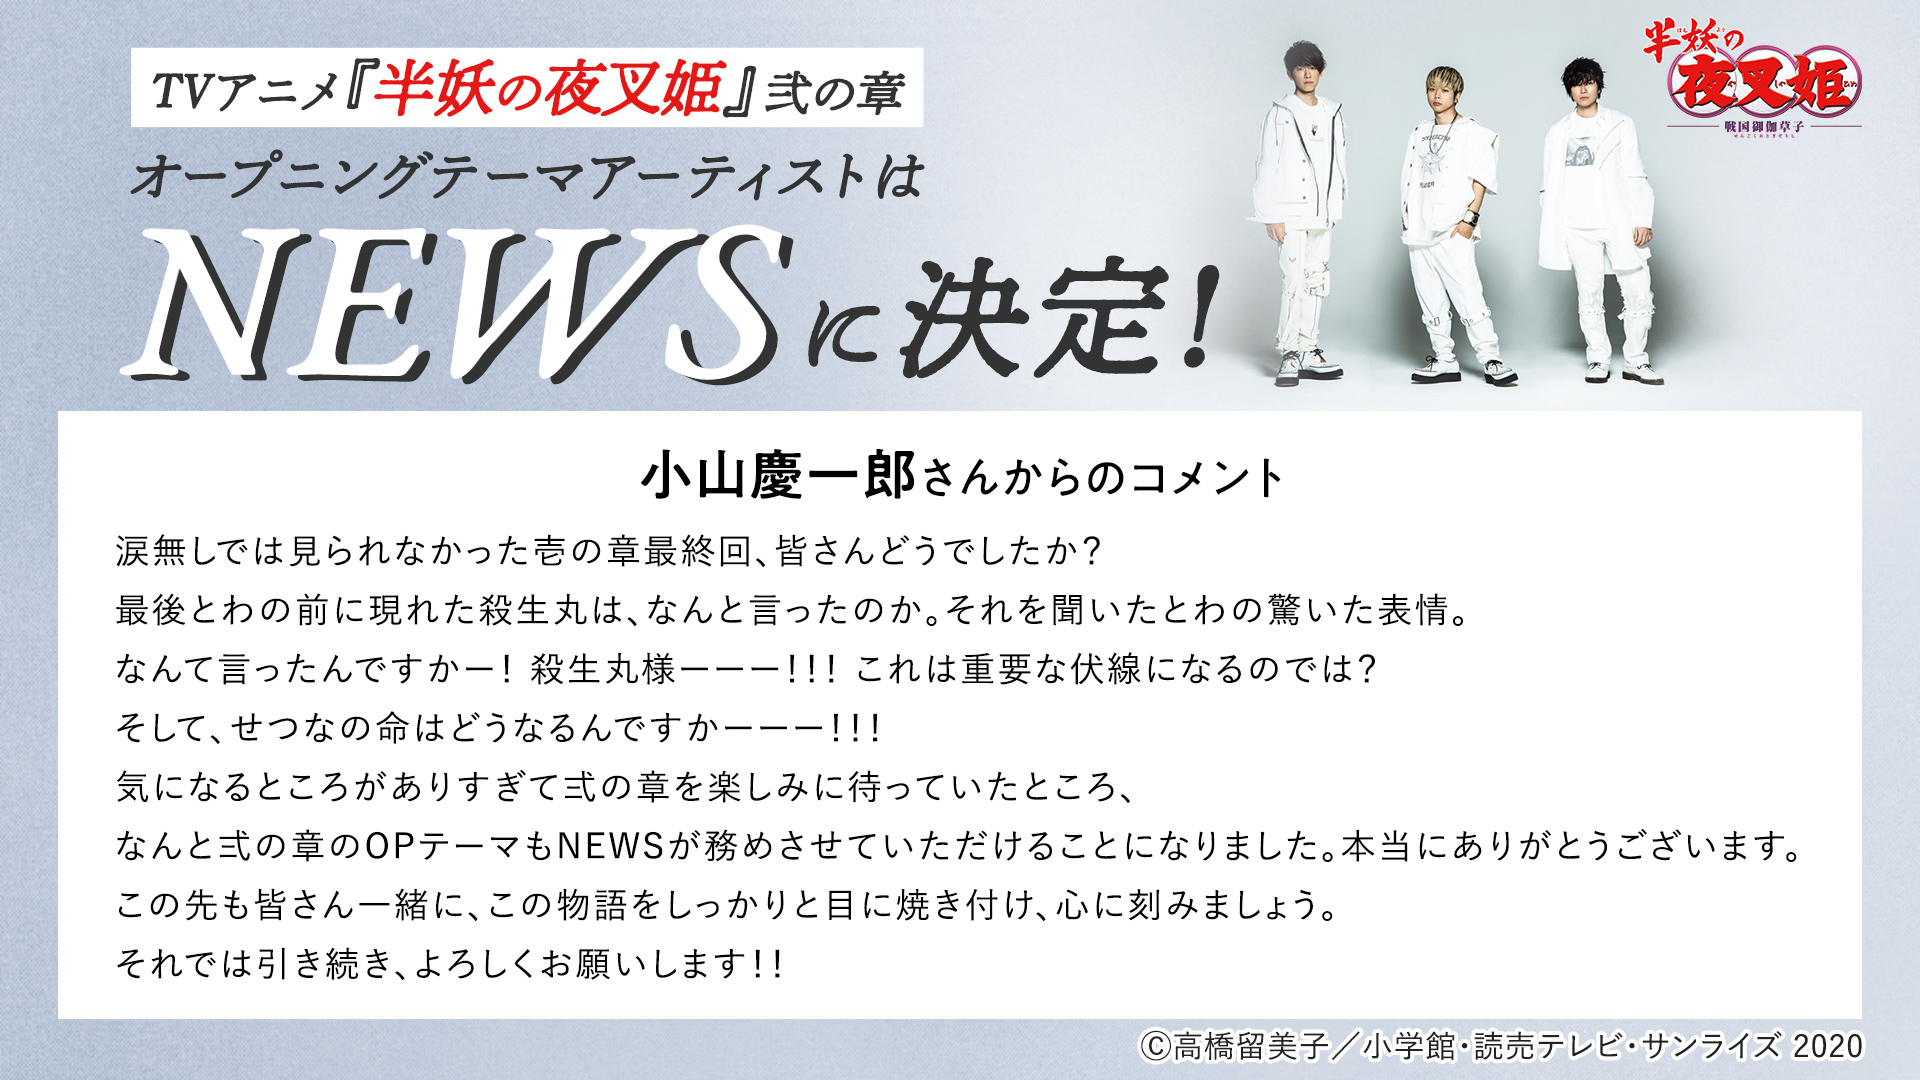 (C)高橋留美子/小学館・読売テレビ・サンライズ 2020